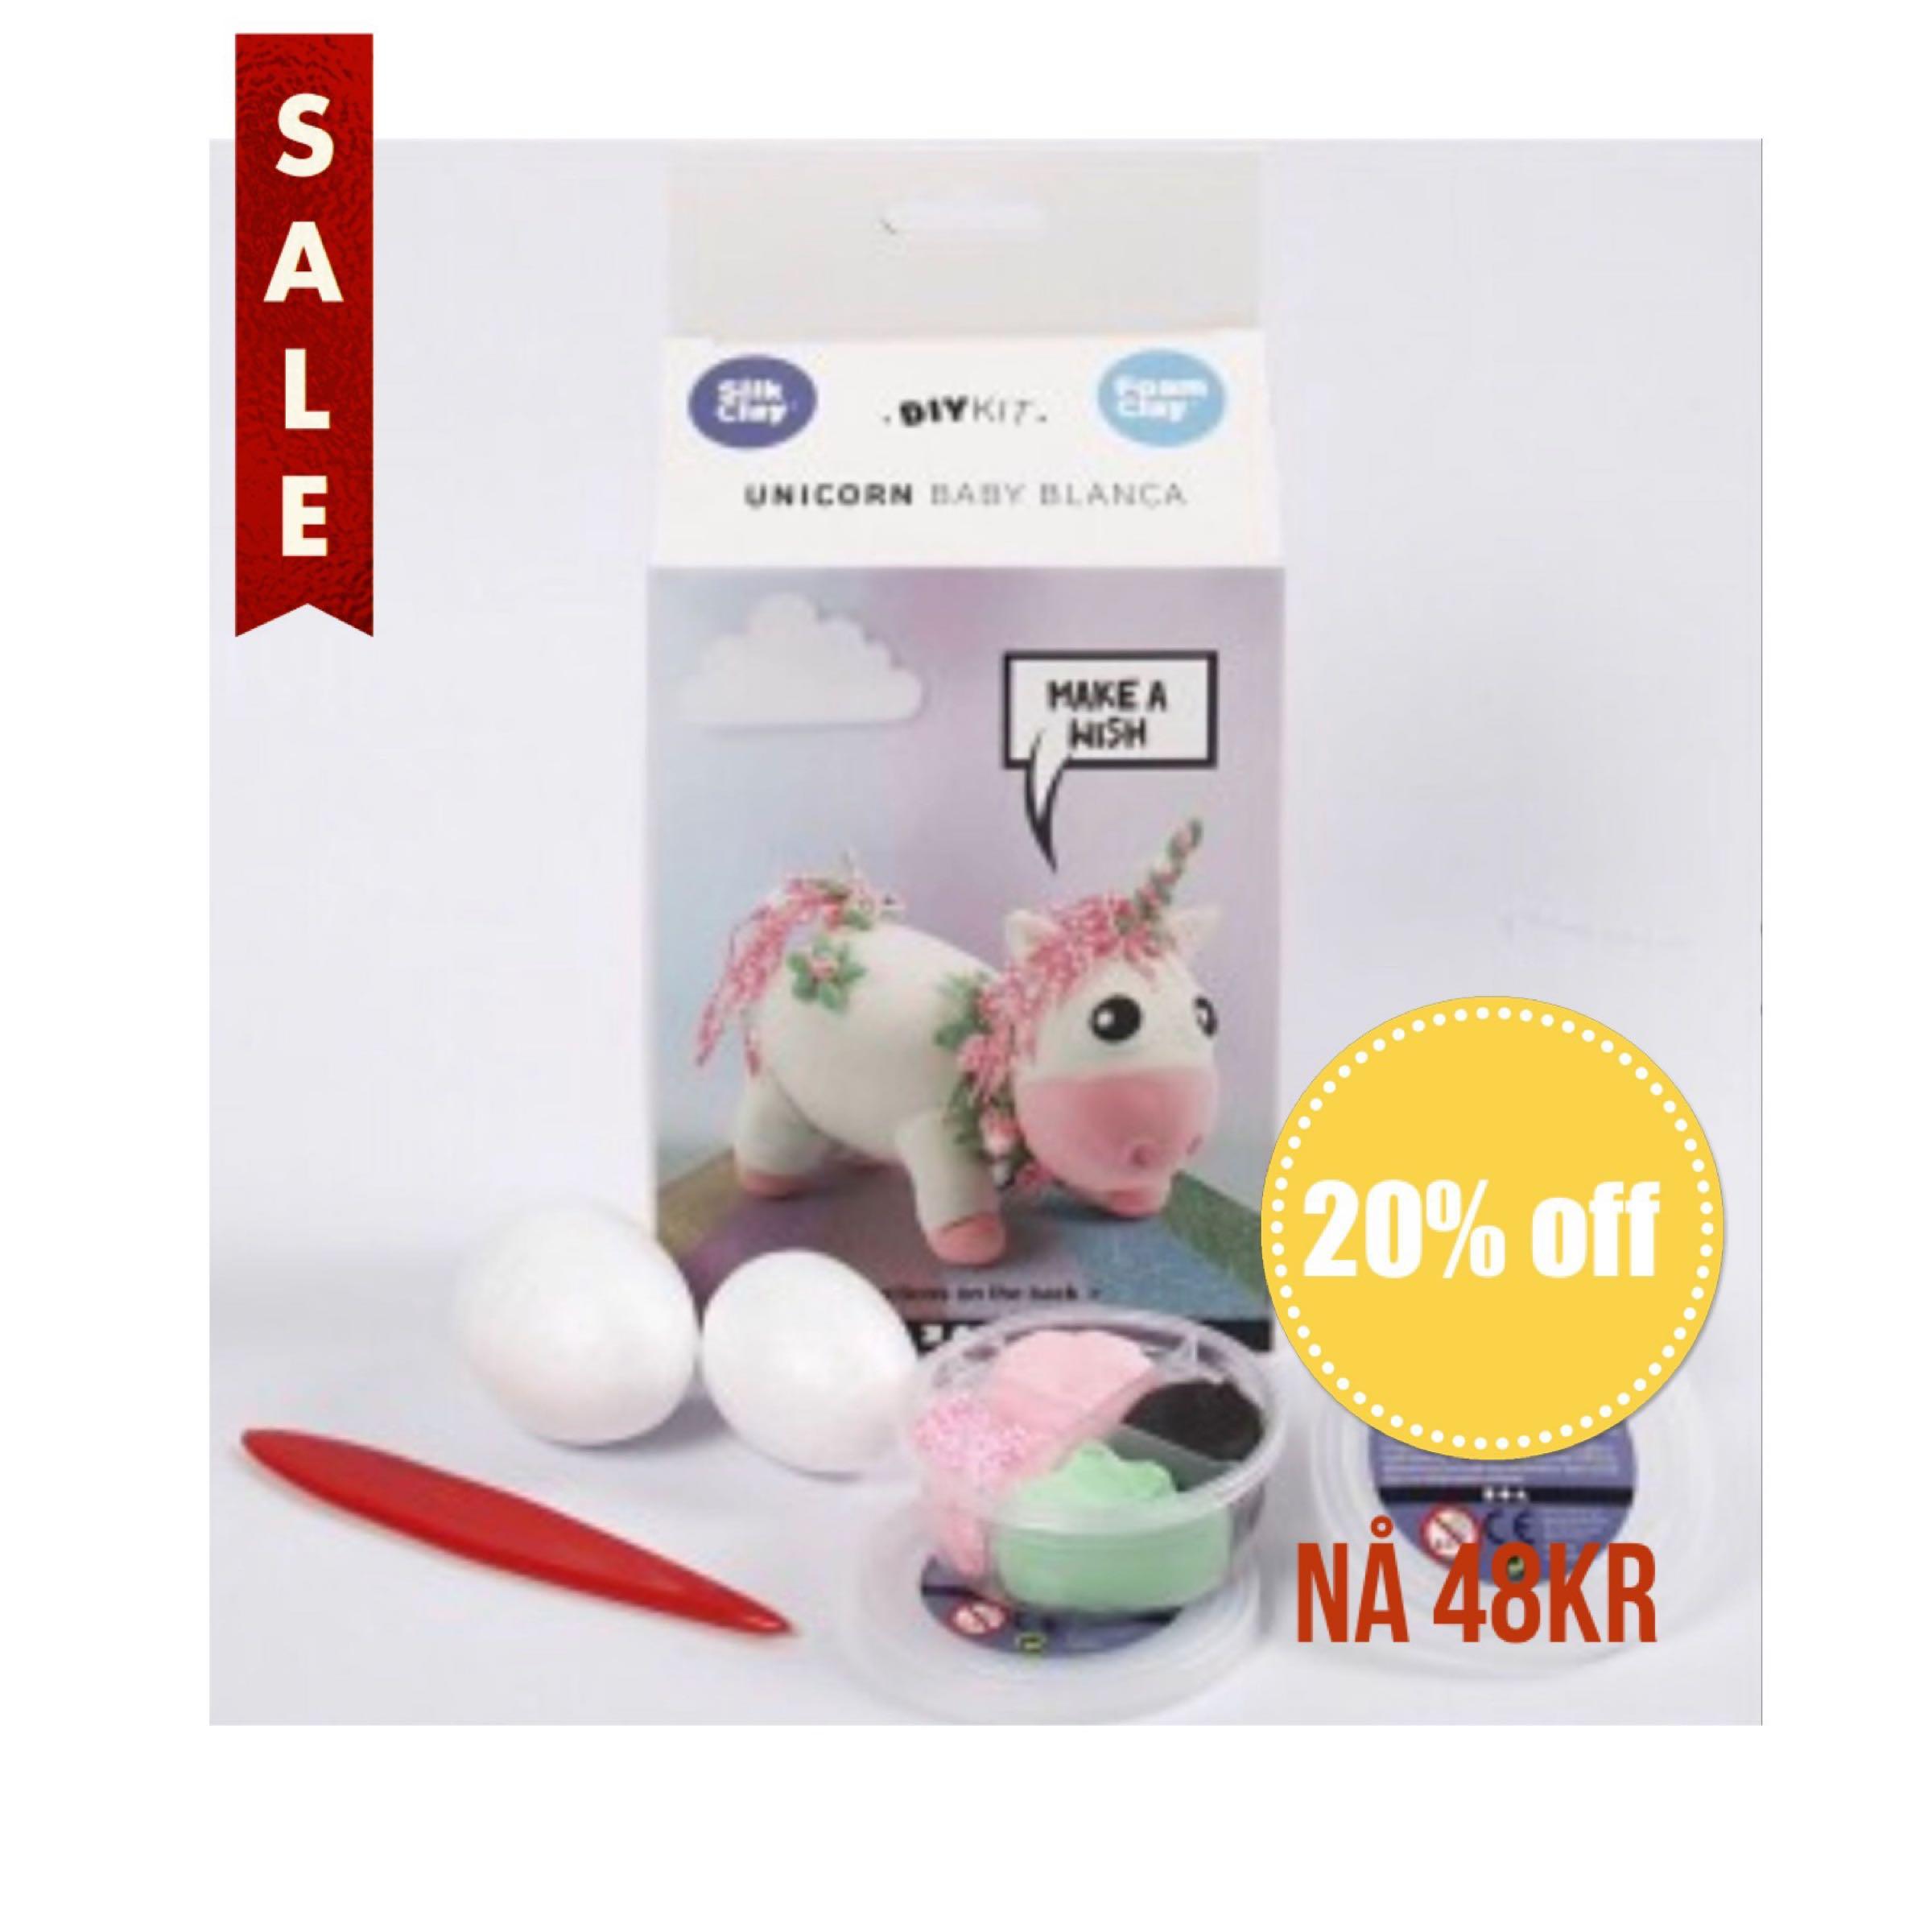 Foam Clay Unicorn Baby Blanca DIY Kit